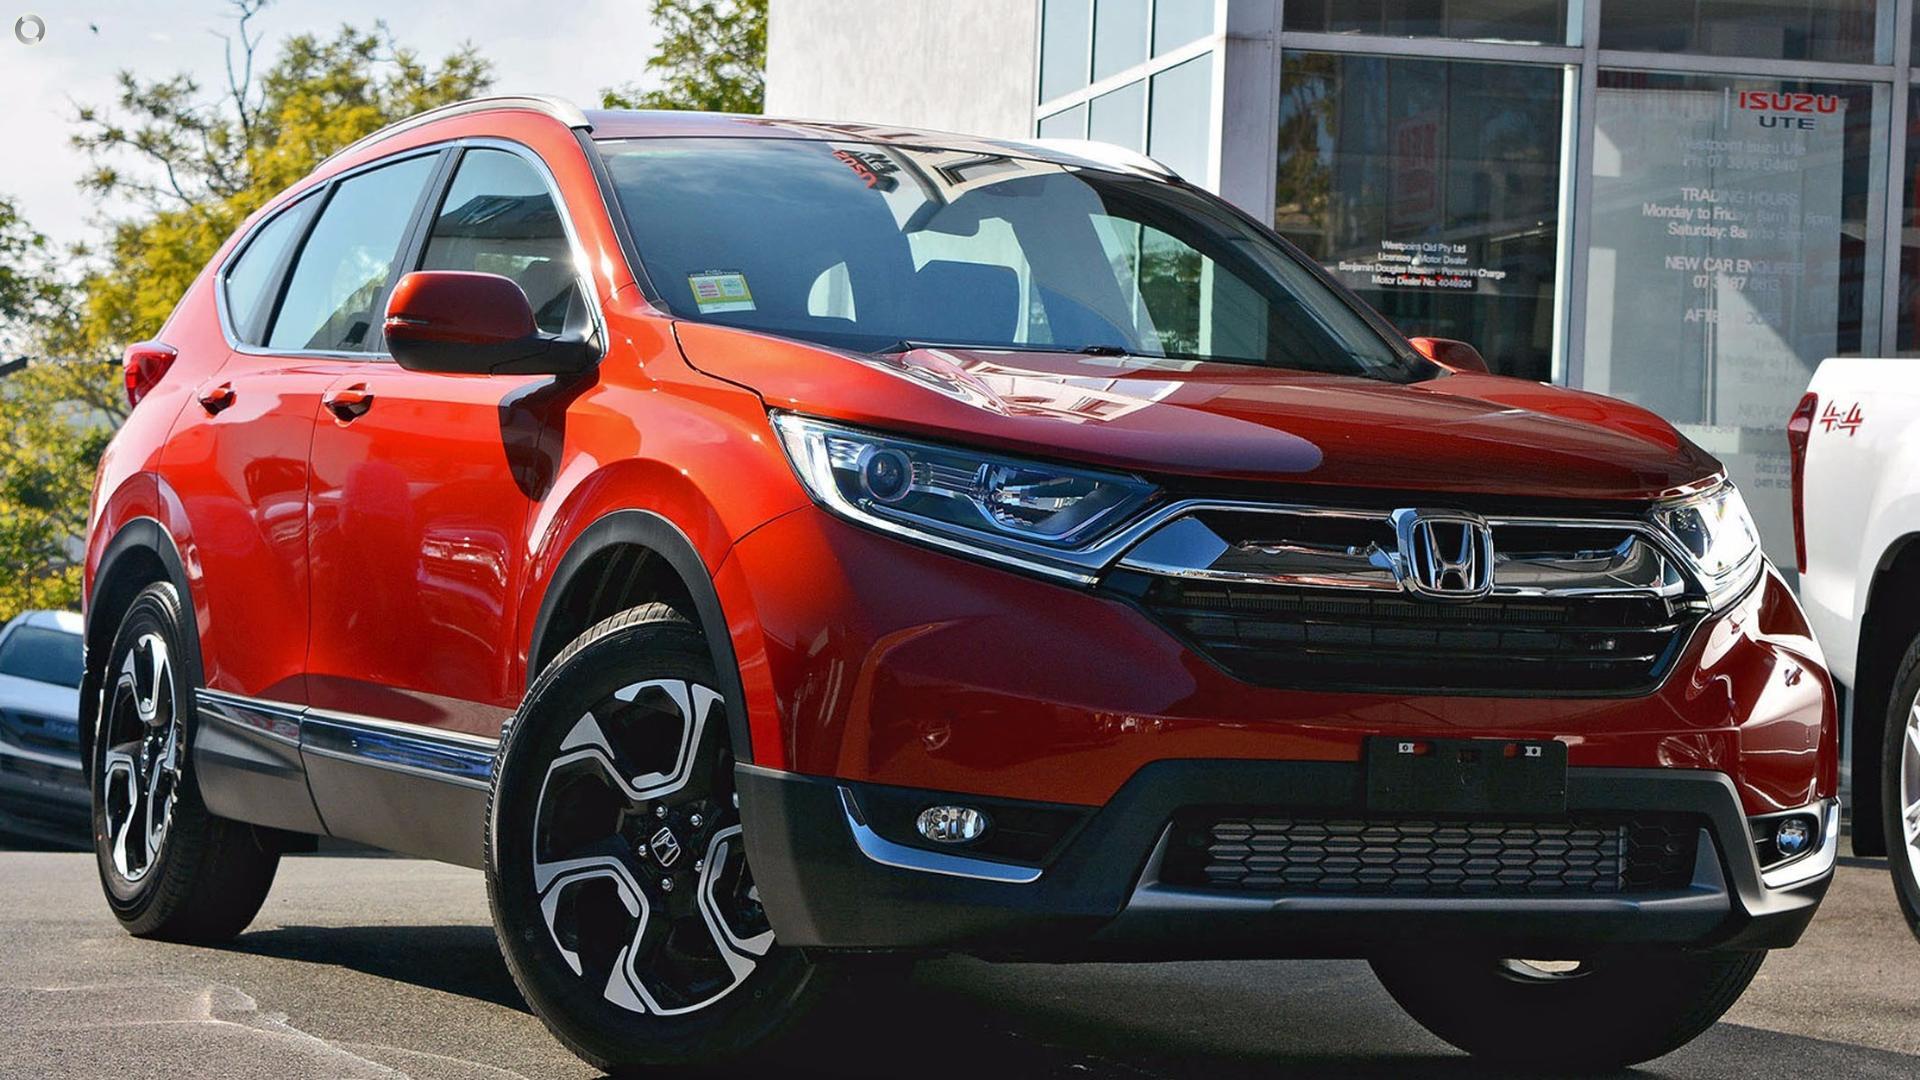 2017 Honda Cr-v VTi-L RW